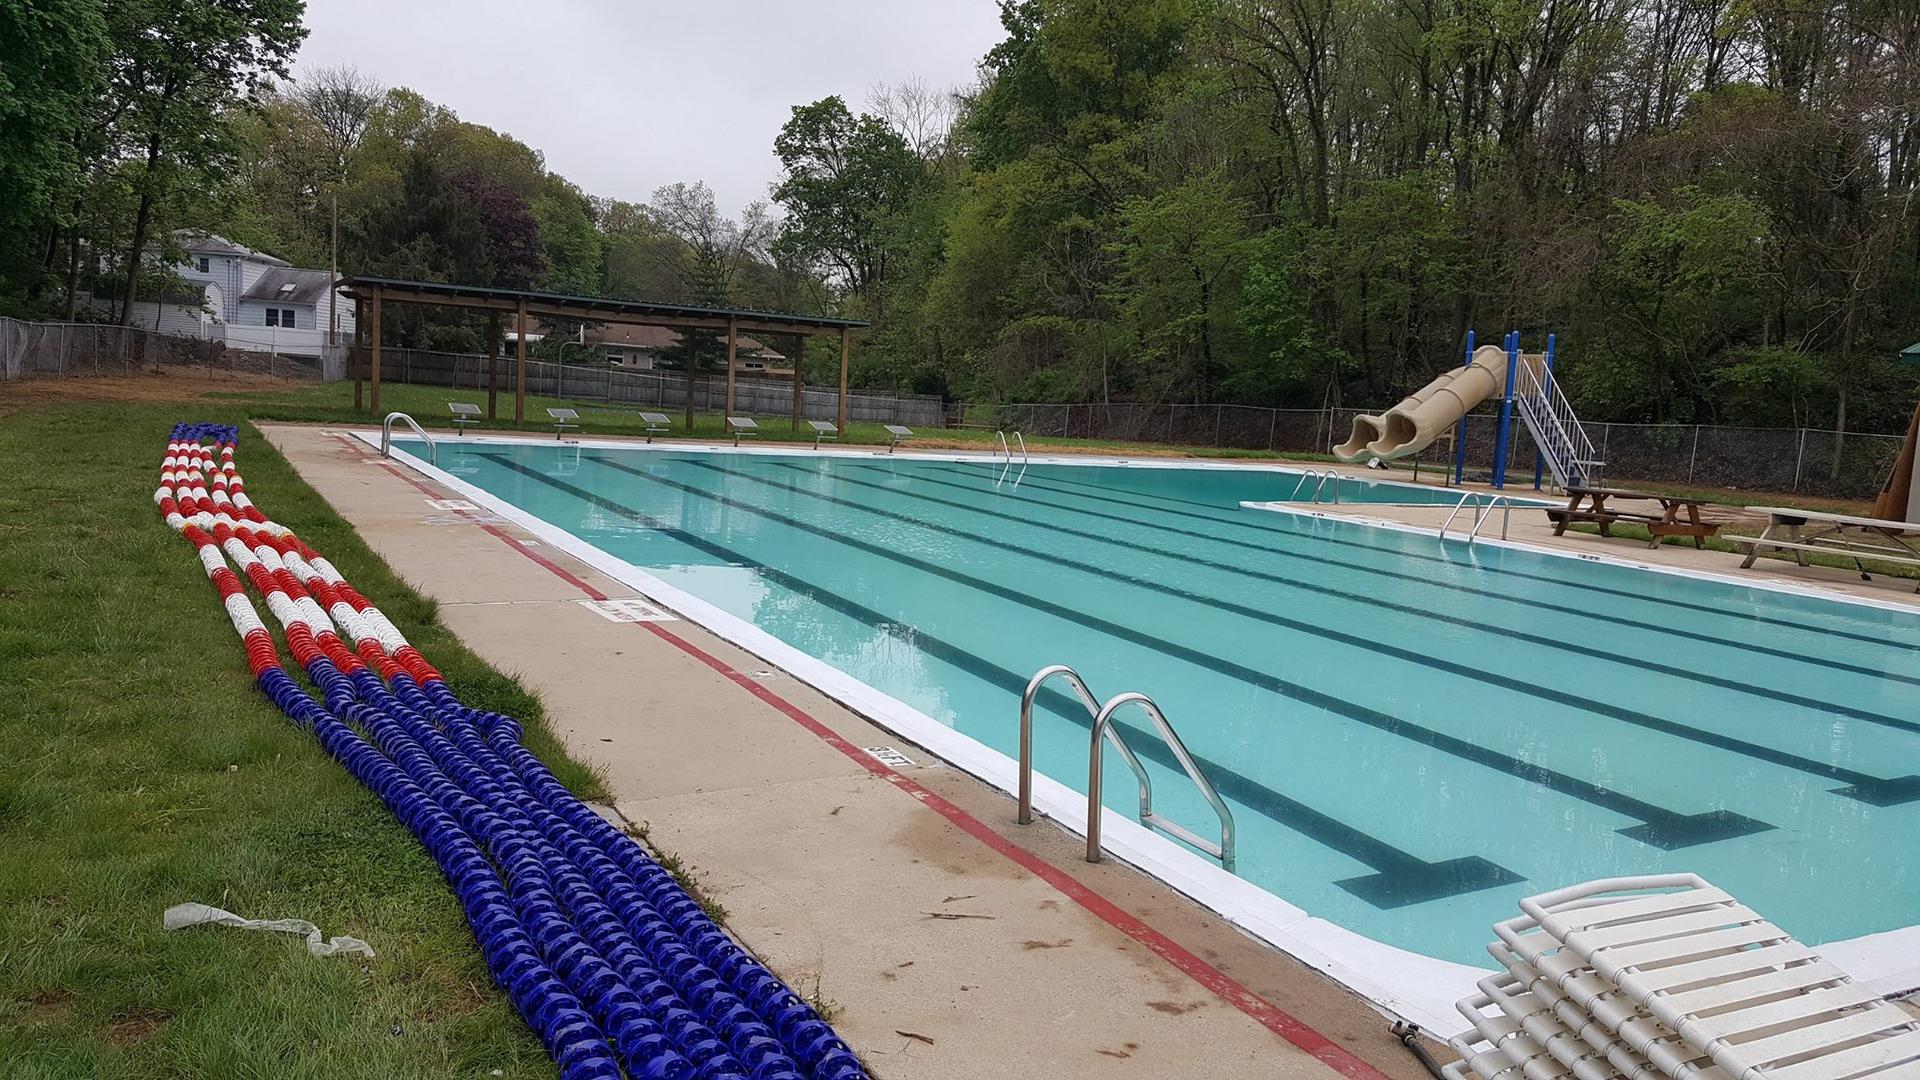 Latshmere Swim Club